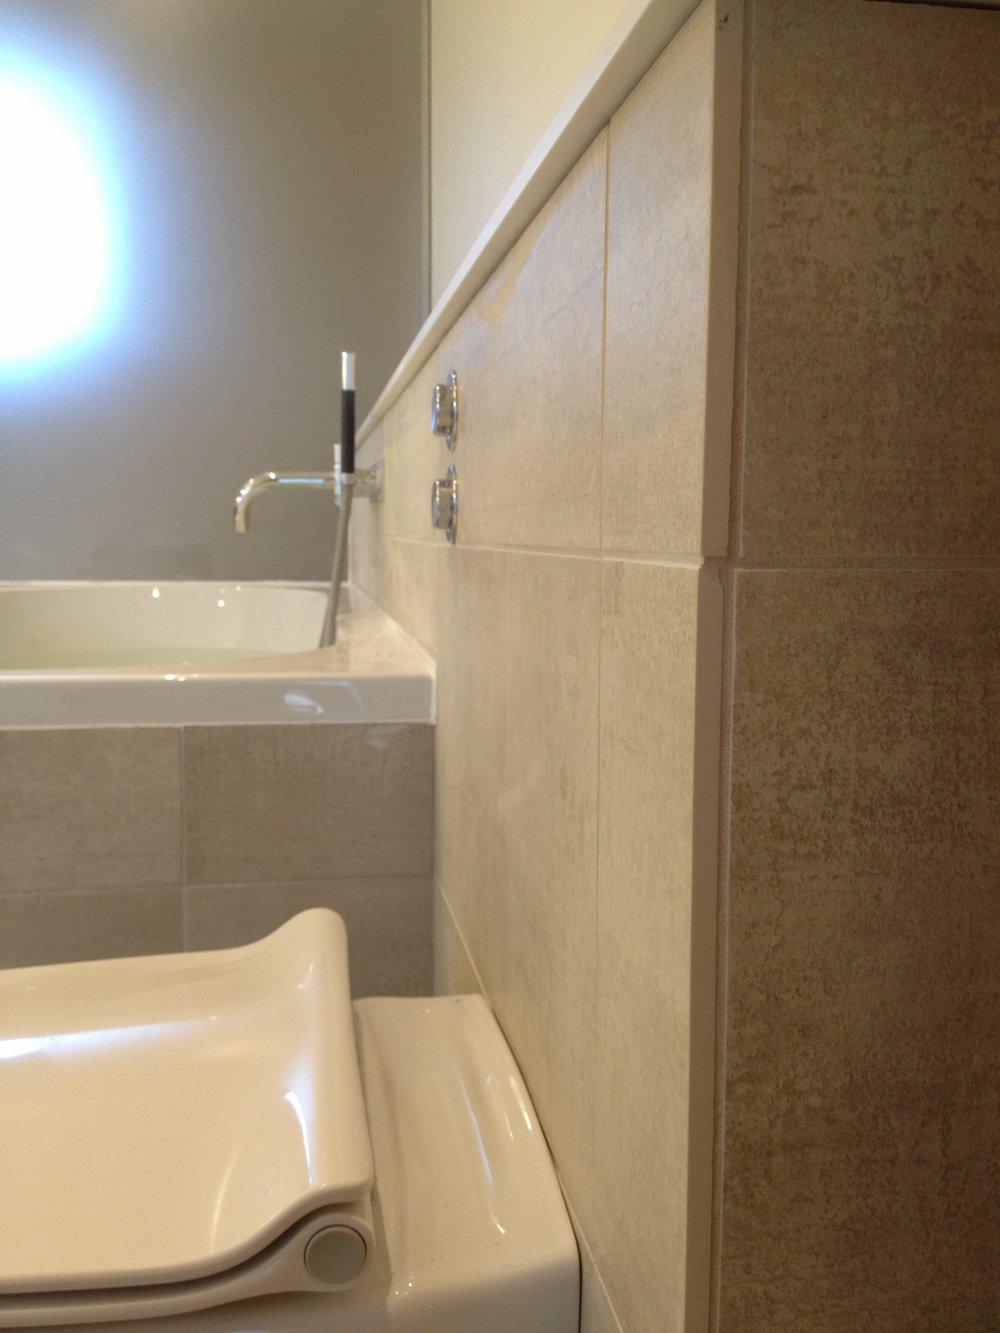 Nyt badeværelse Klinker.jpg